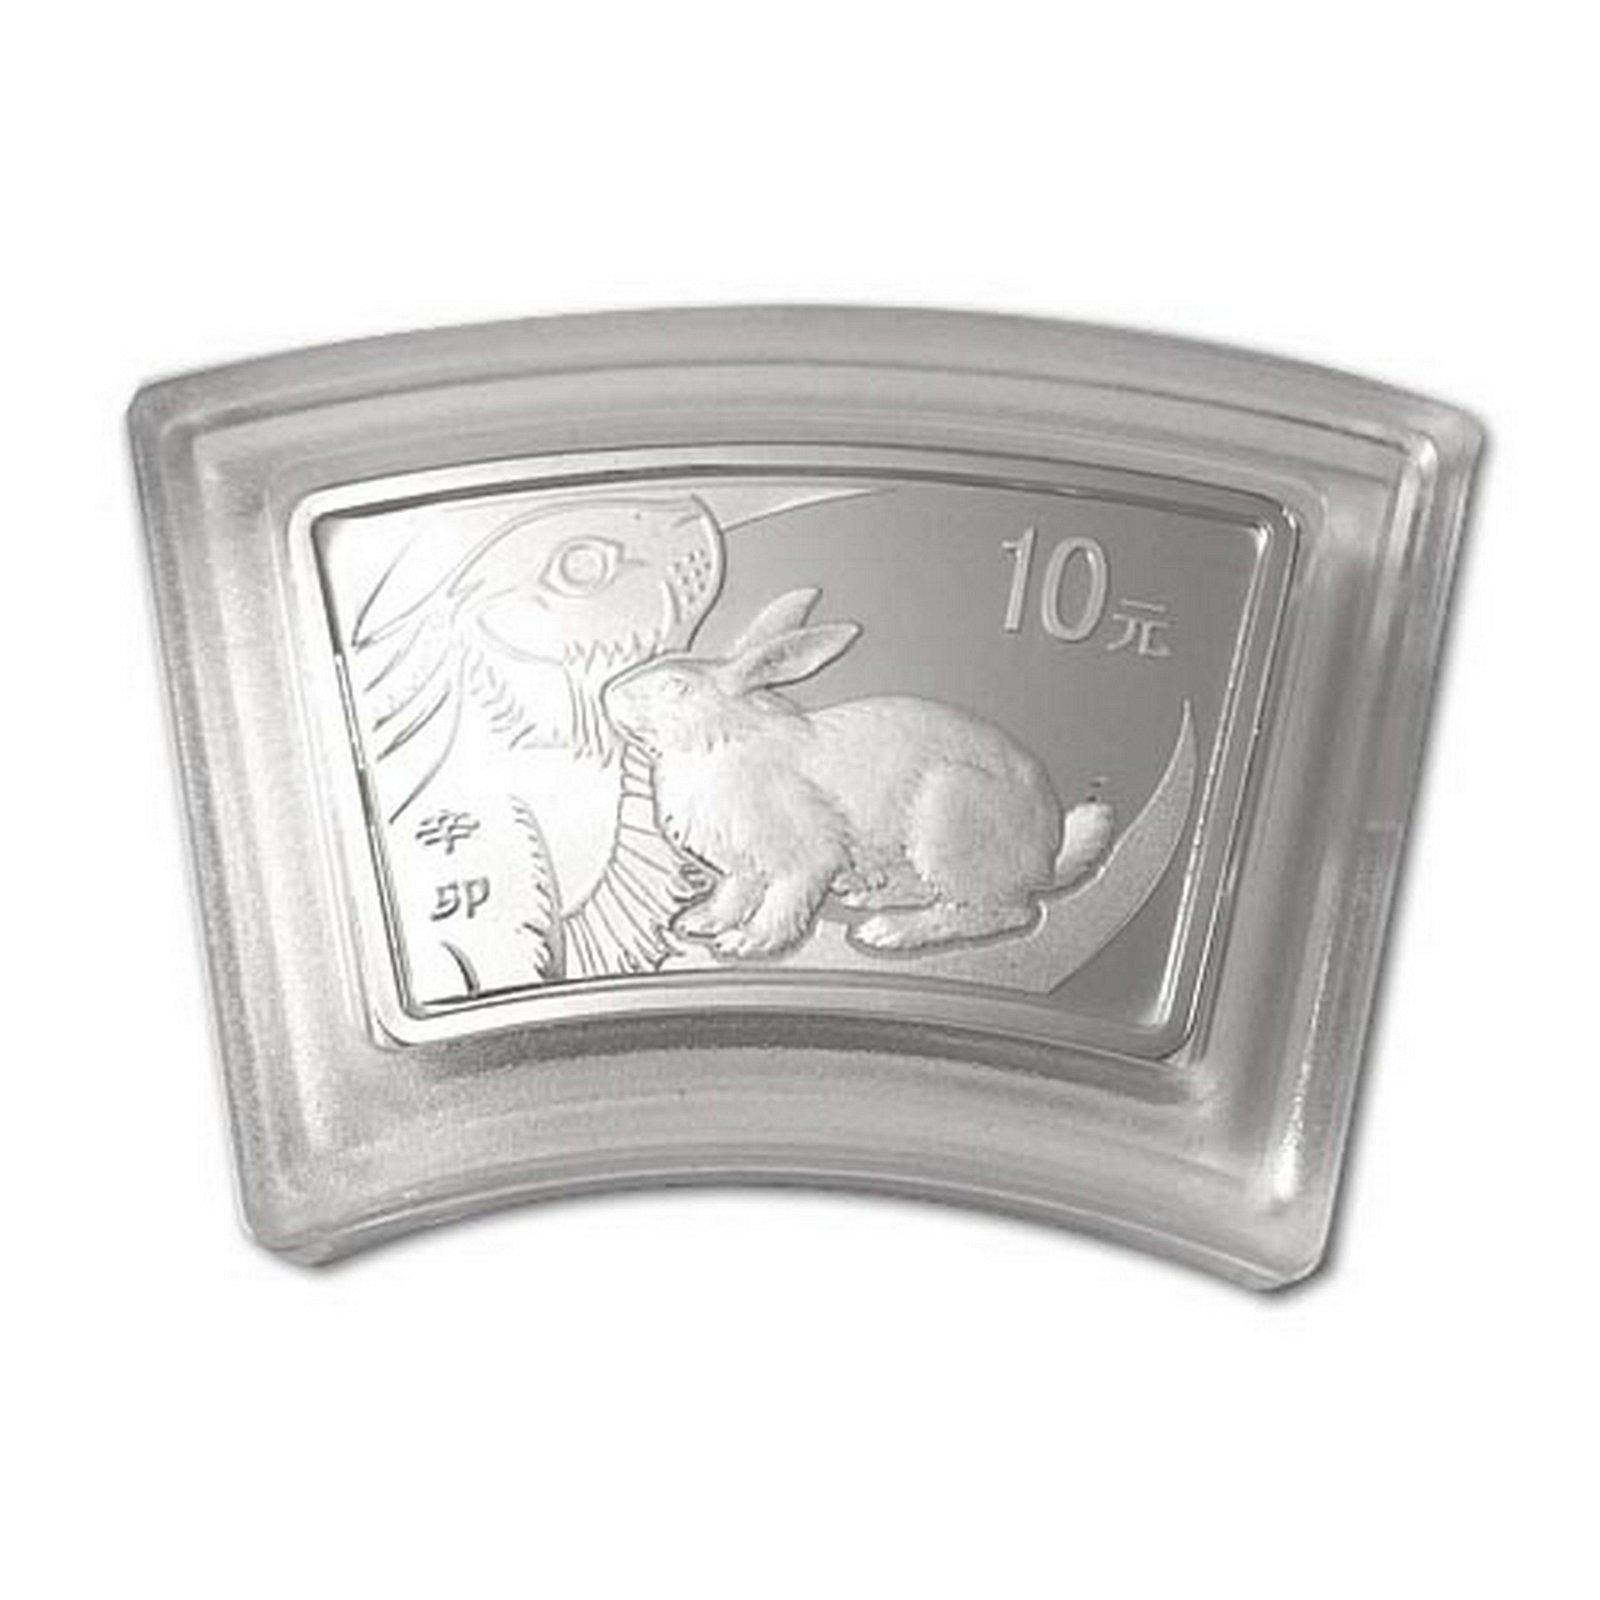 China 2011 Year of the Rabbit 1 oz Silver Fan (w Box &